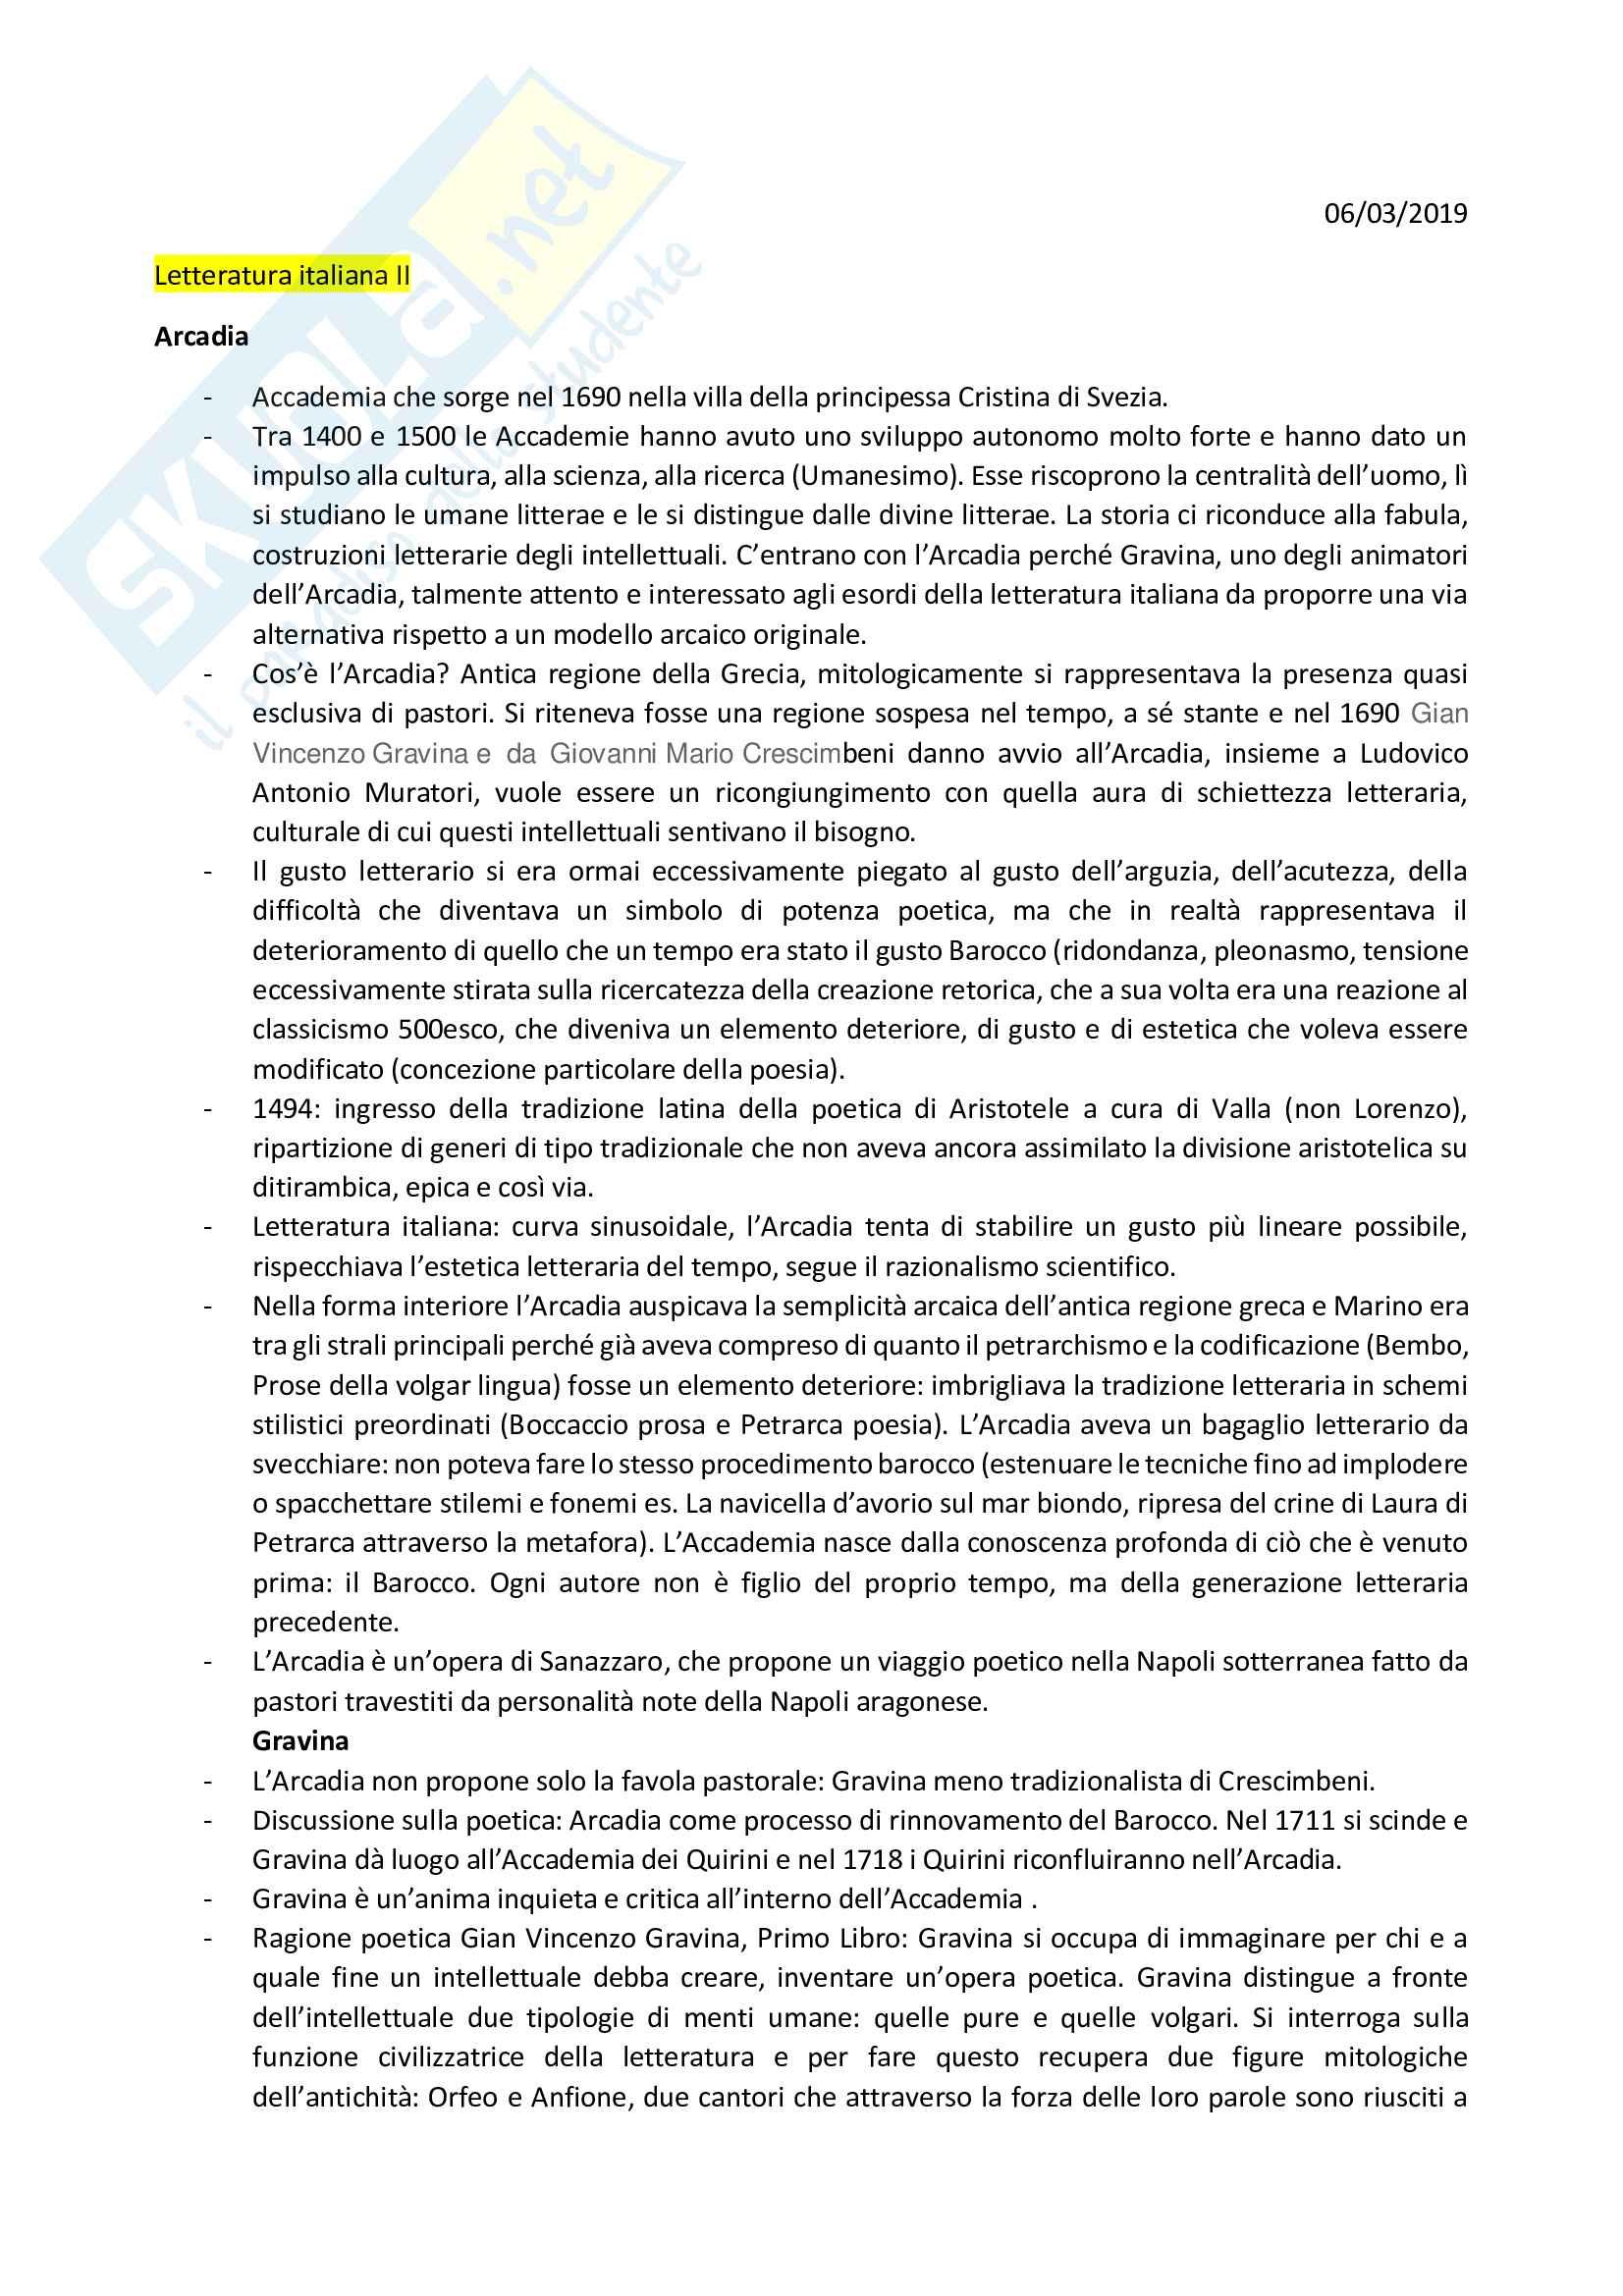 Letteratura Italiana II